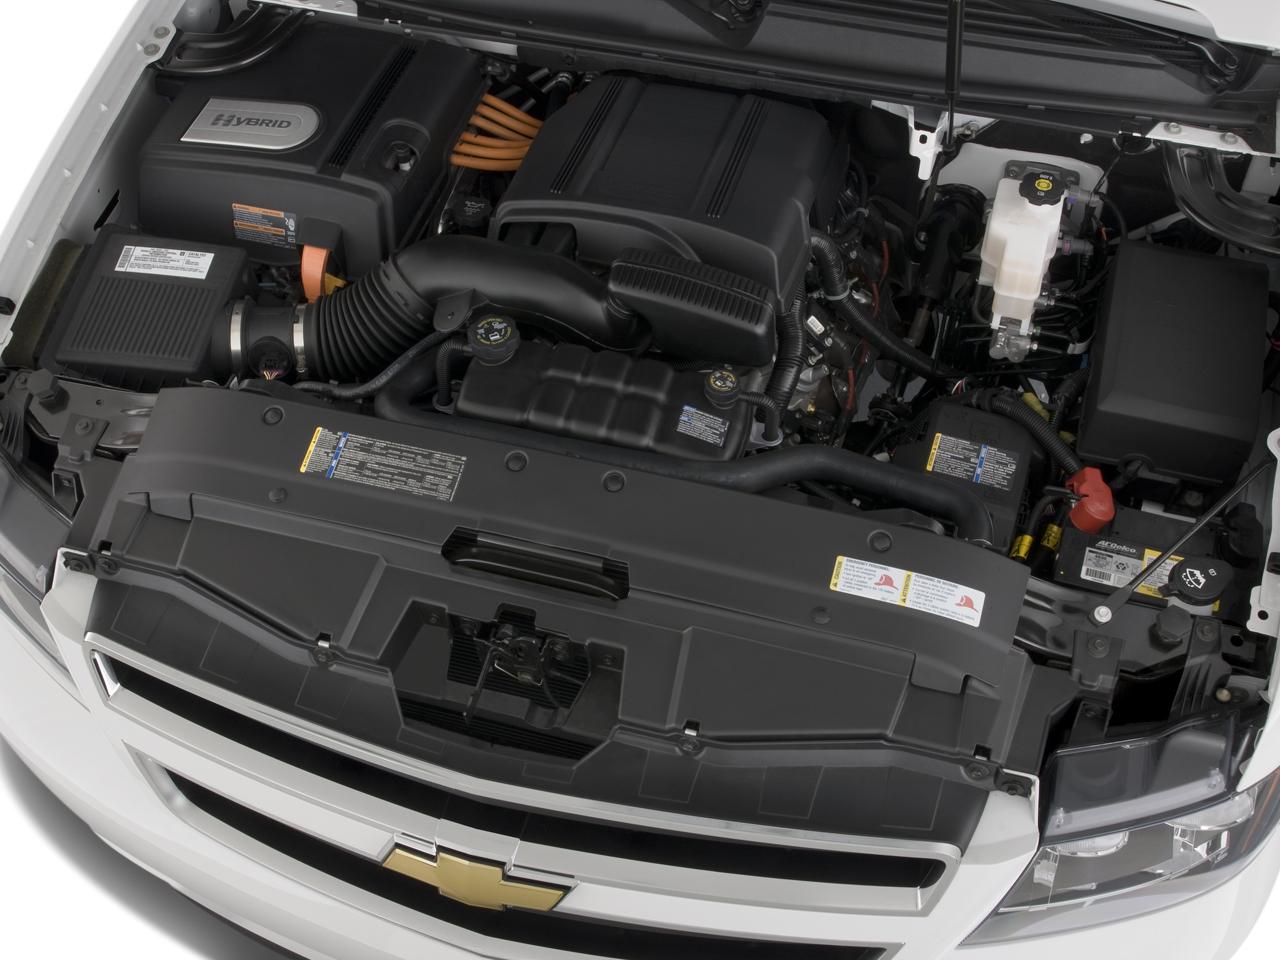 2008 Chevytahoe Hybrid Chevy Suv Review Automobile Magazine Nissan Nv3500 Transmission Wiring Harness 13 84